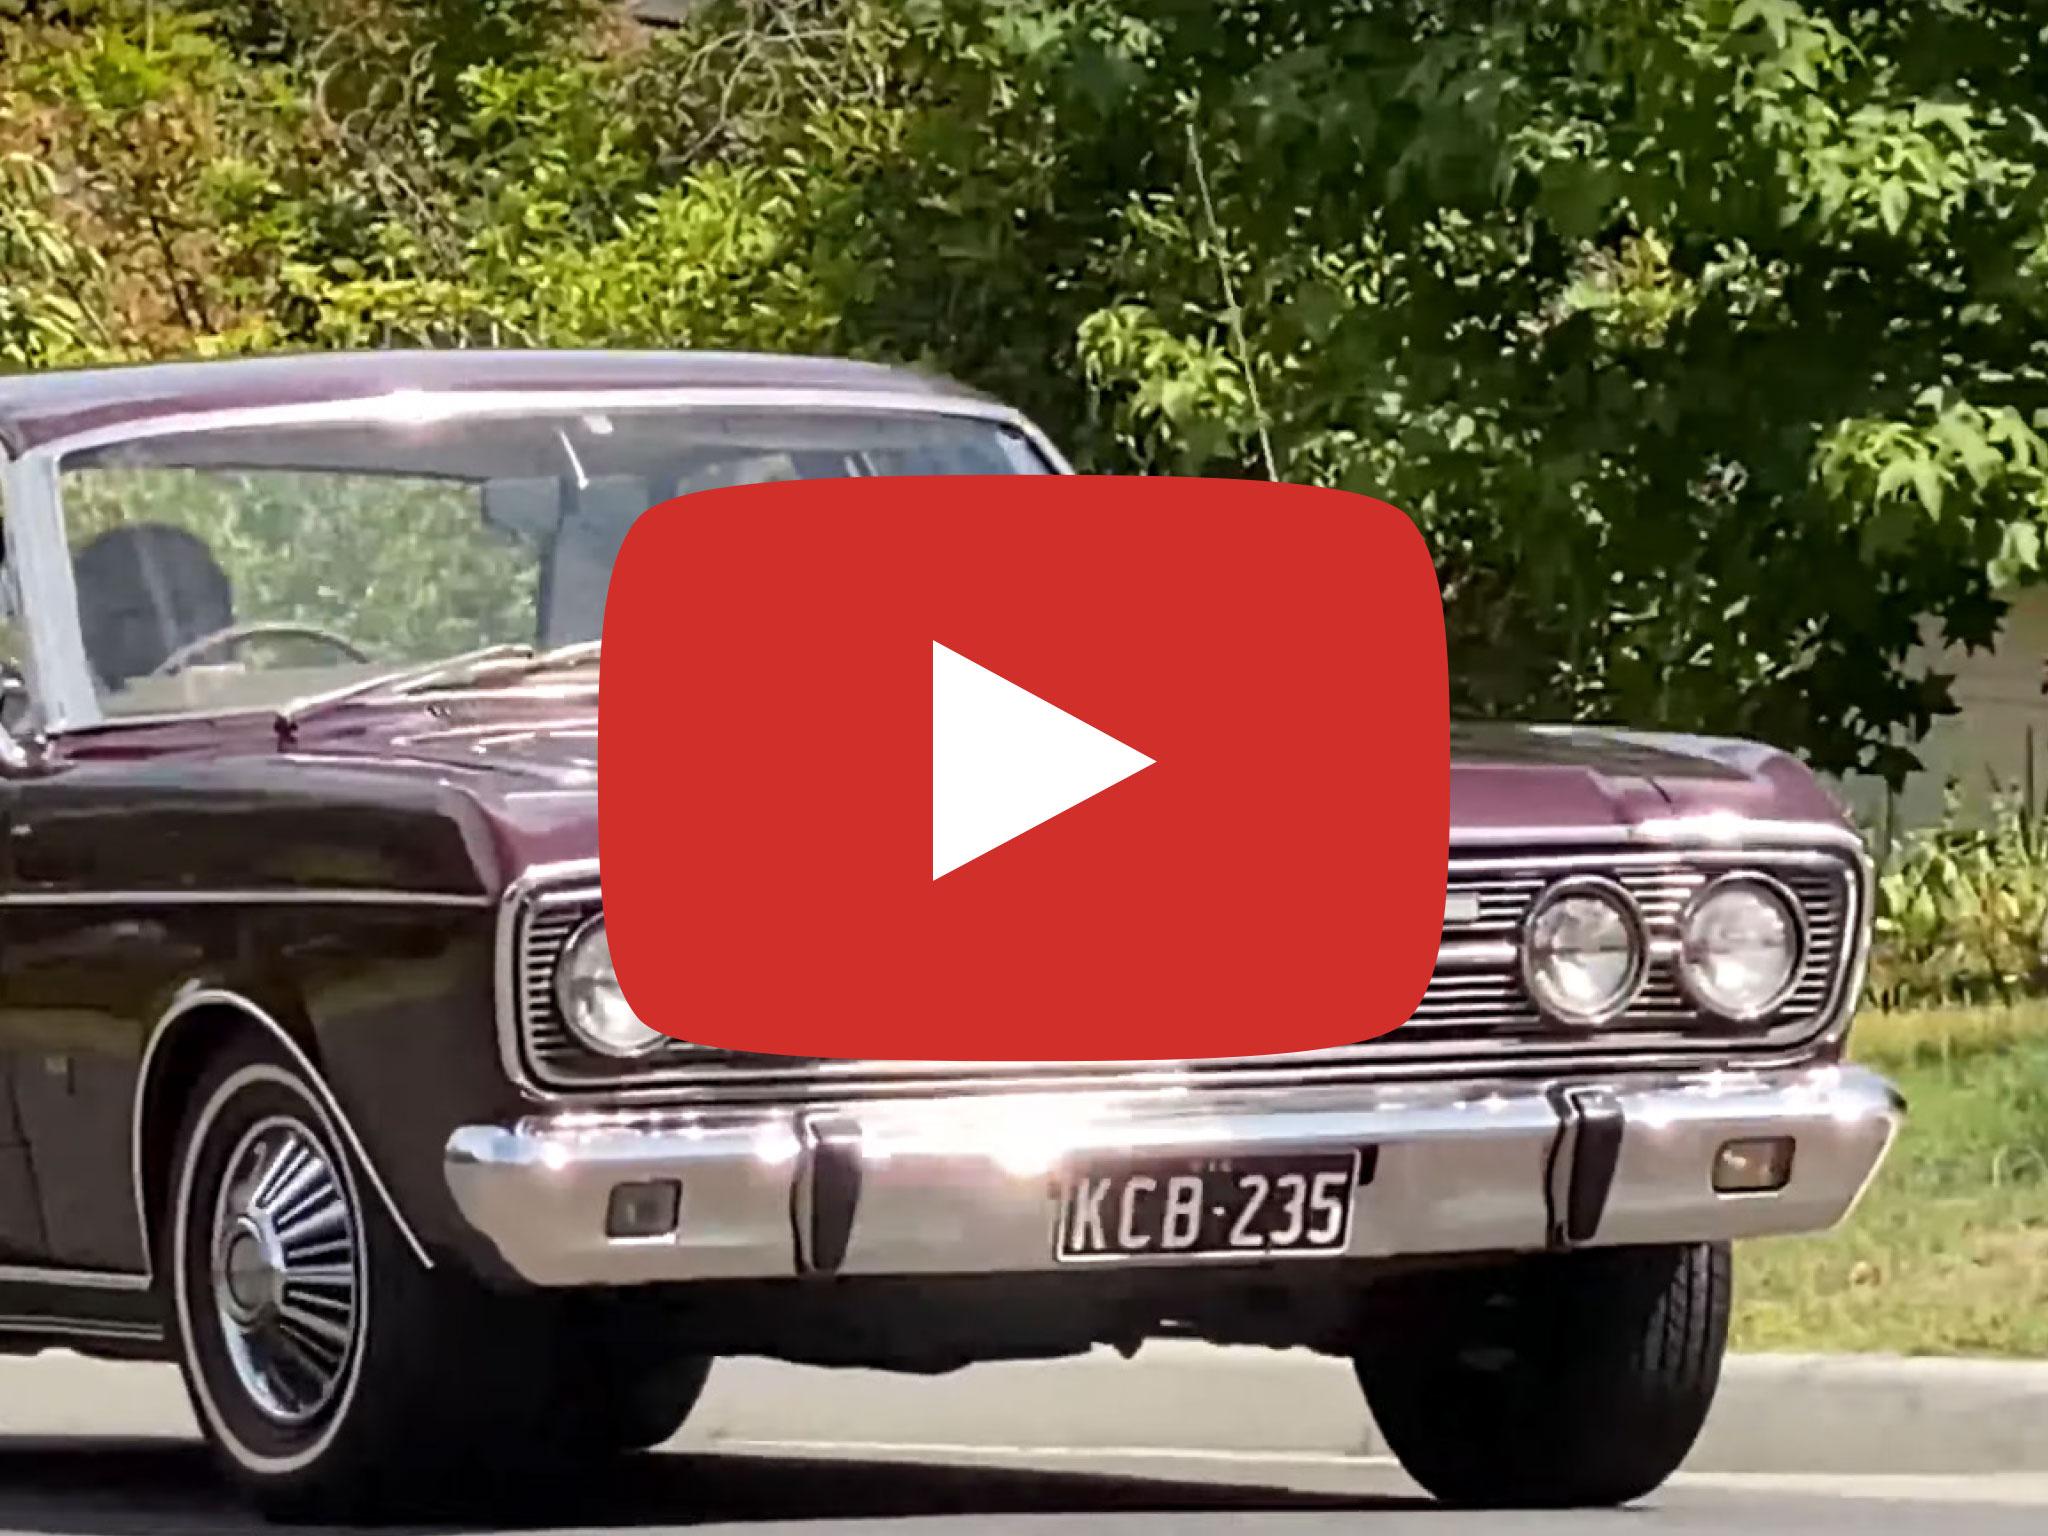 Ford Fairlane 500, 1968 version, Video, Mt Waverley. Video taken by Ralf Boetker in January 2020